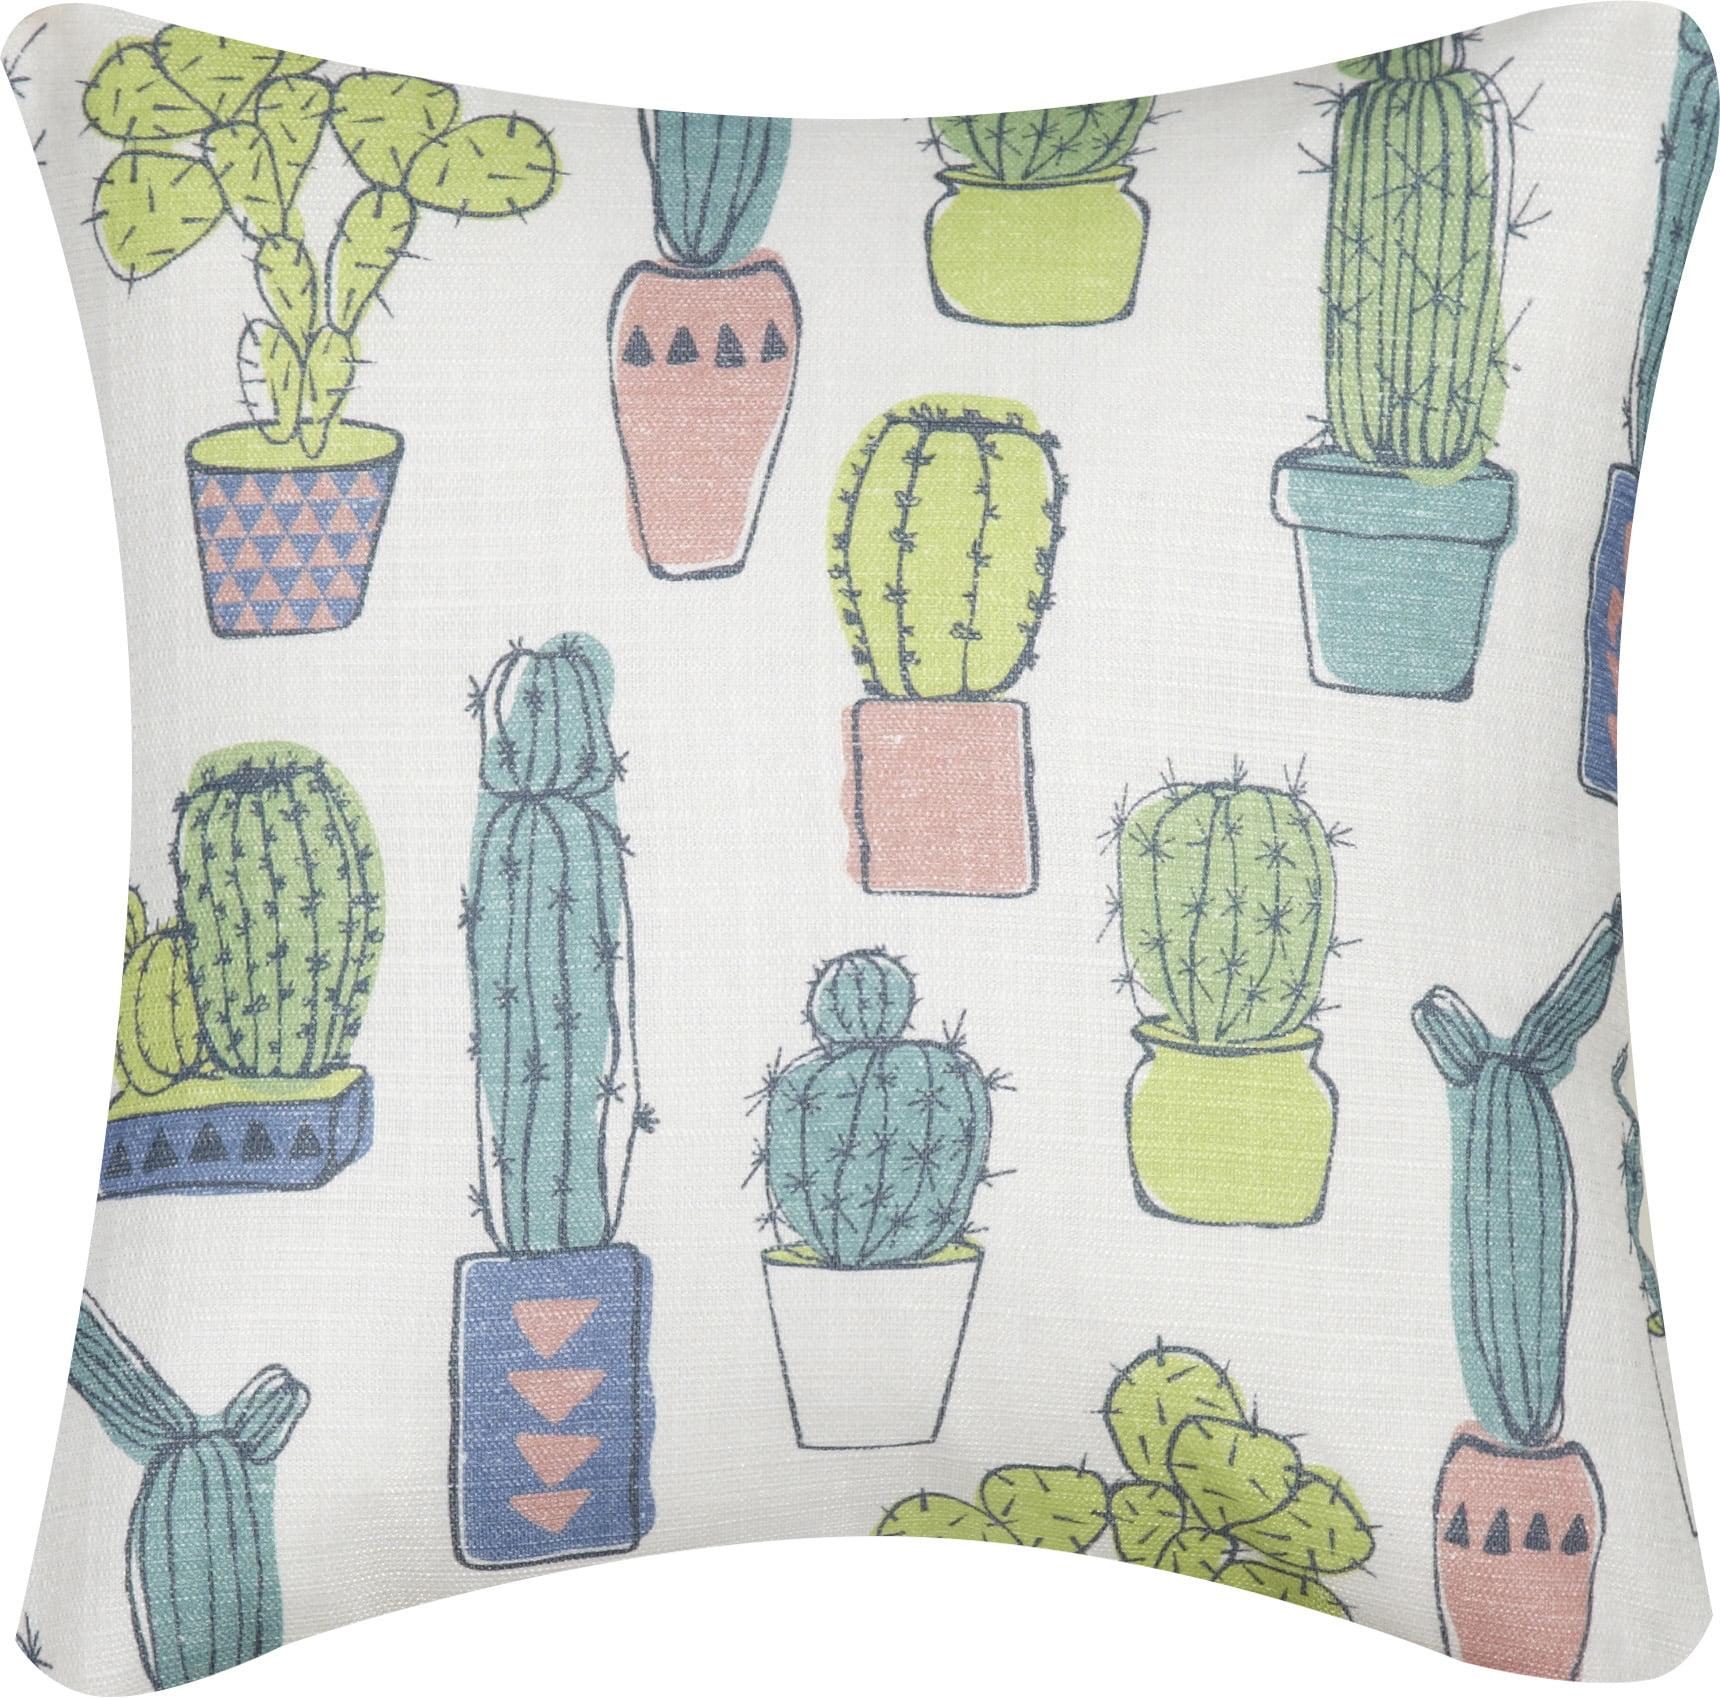 mainstays cactus decorative throw pillow 16 x 16 walmart com